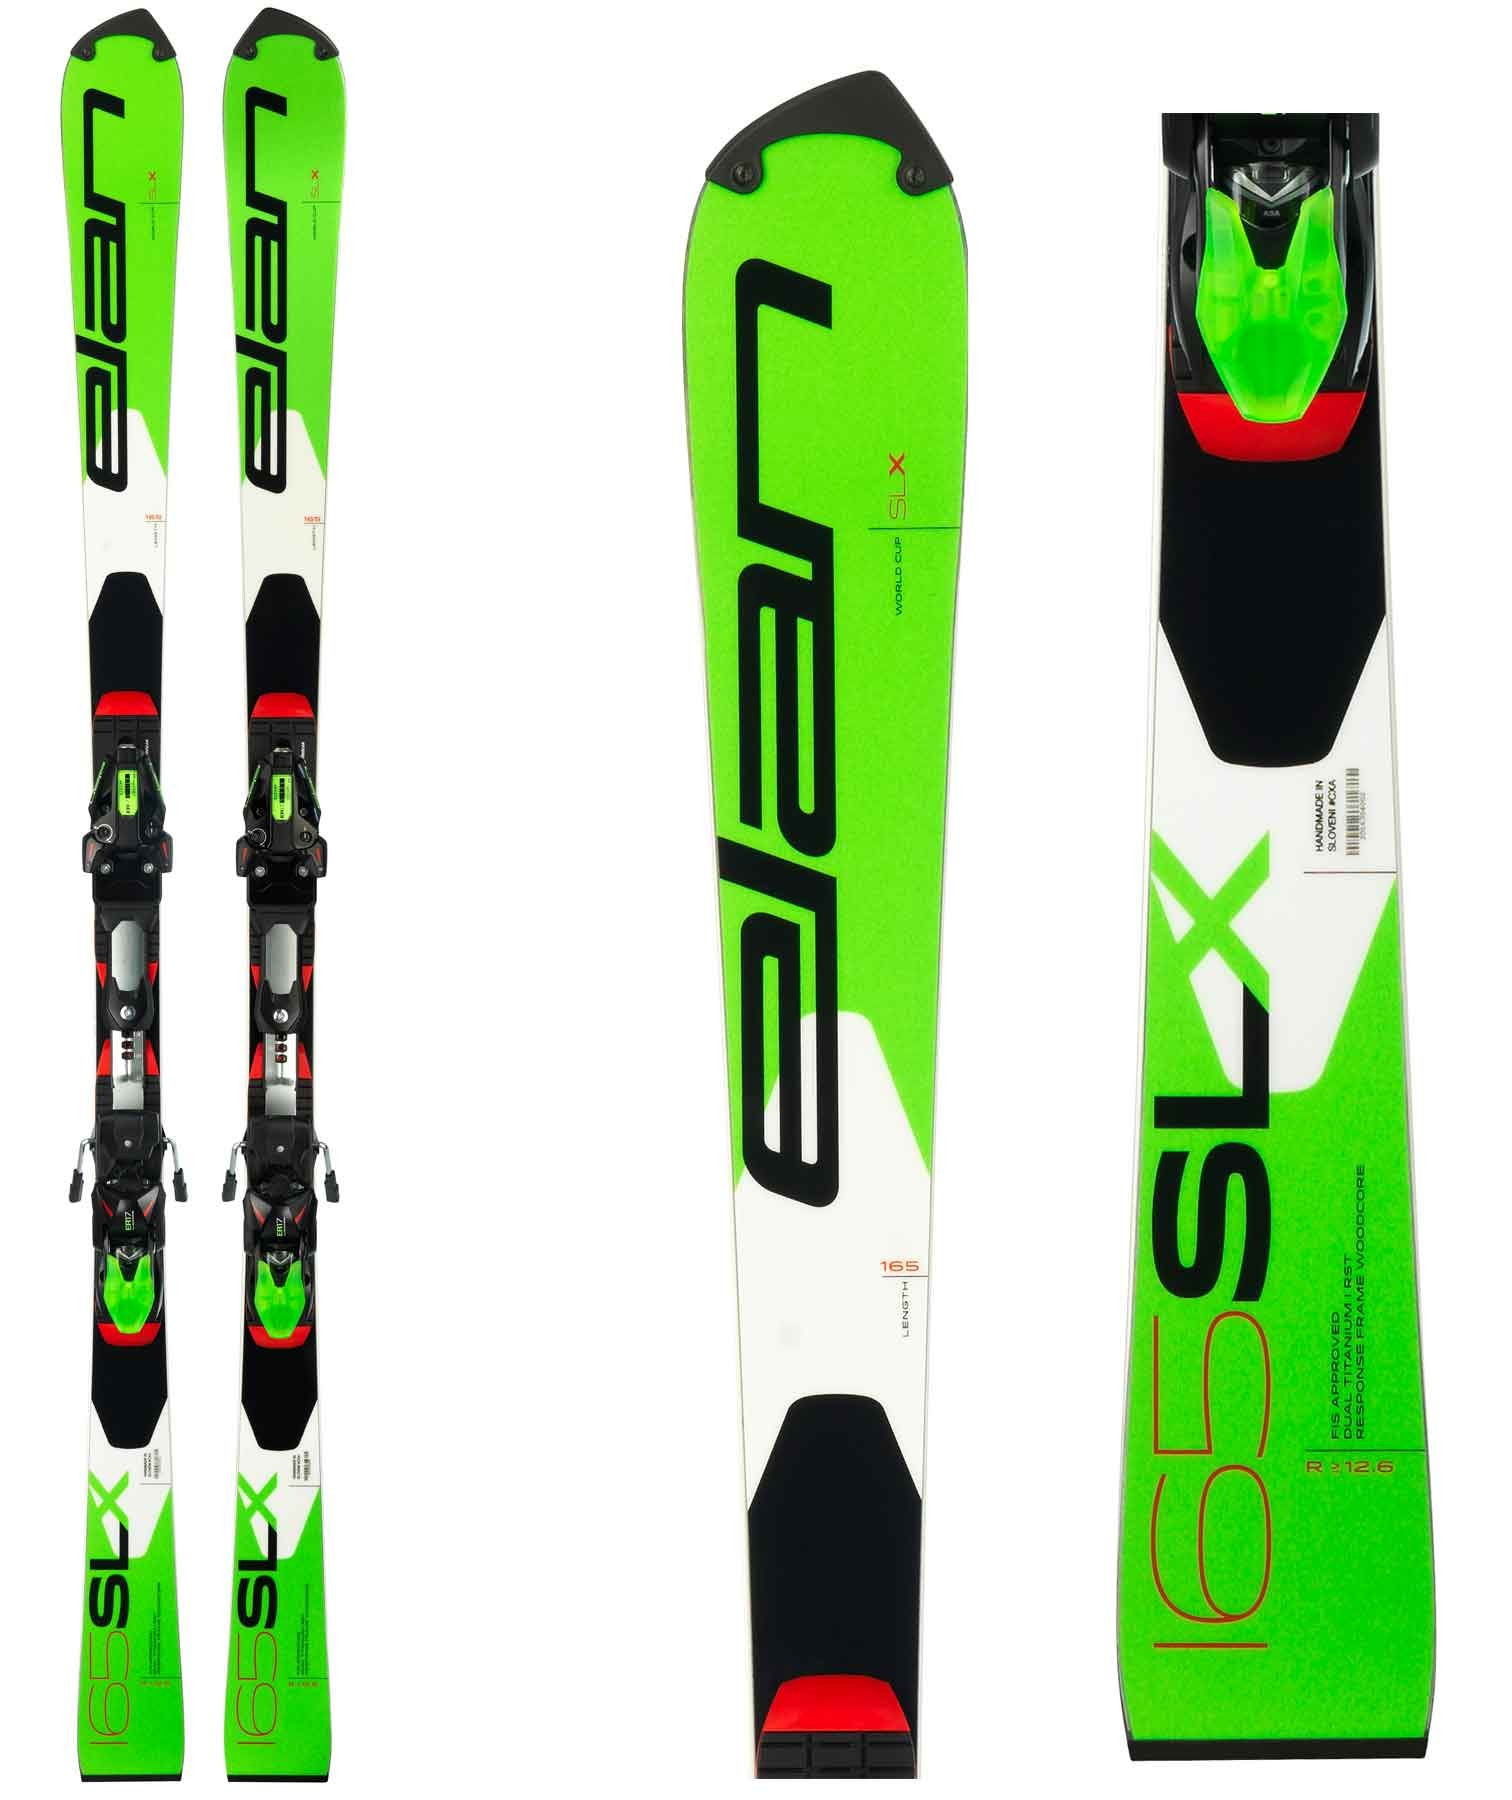 Elan SLX FIS World Cup Plate, racing slalom skis, 2019